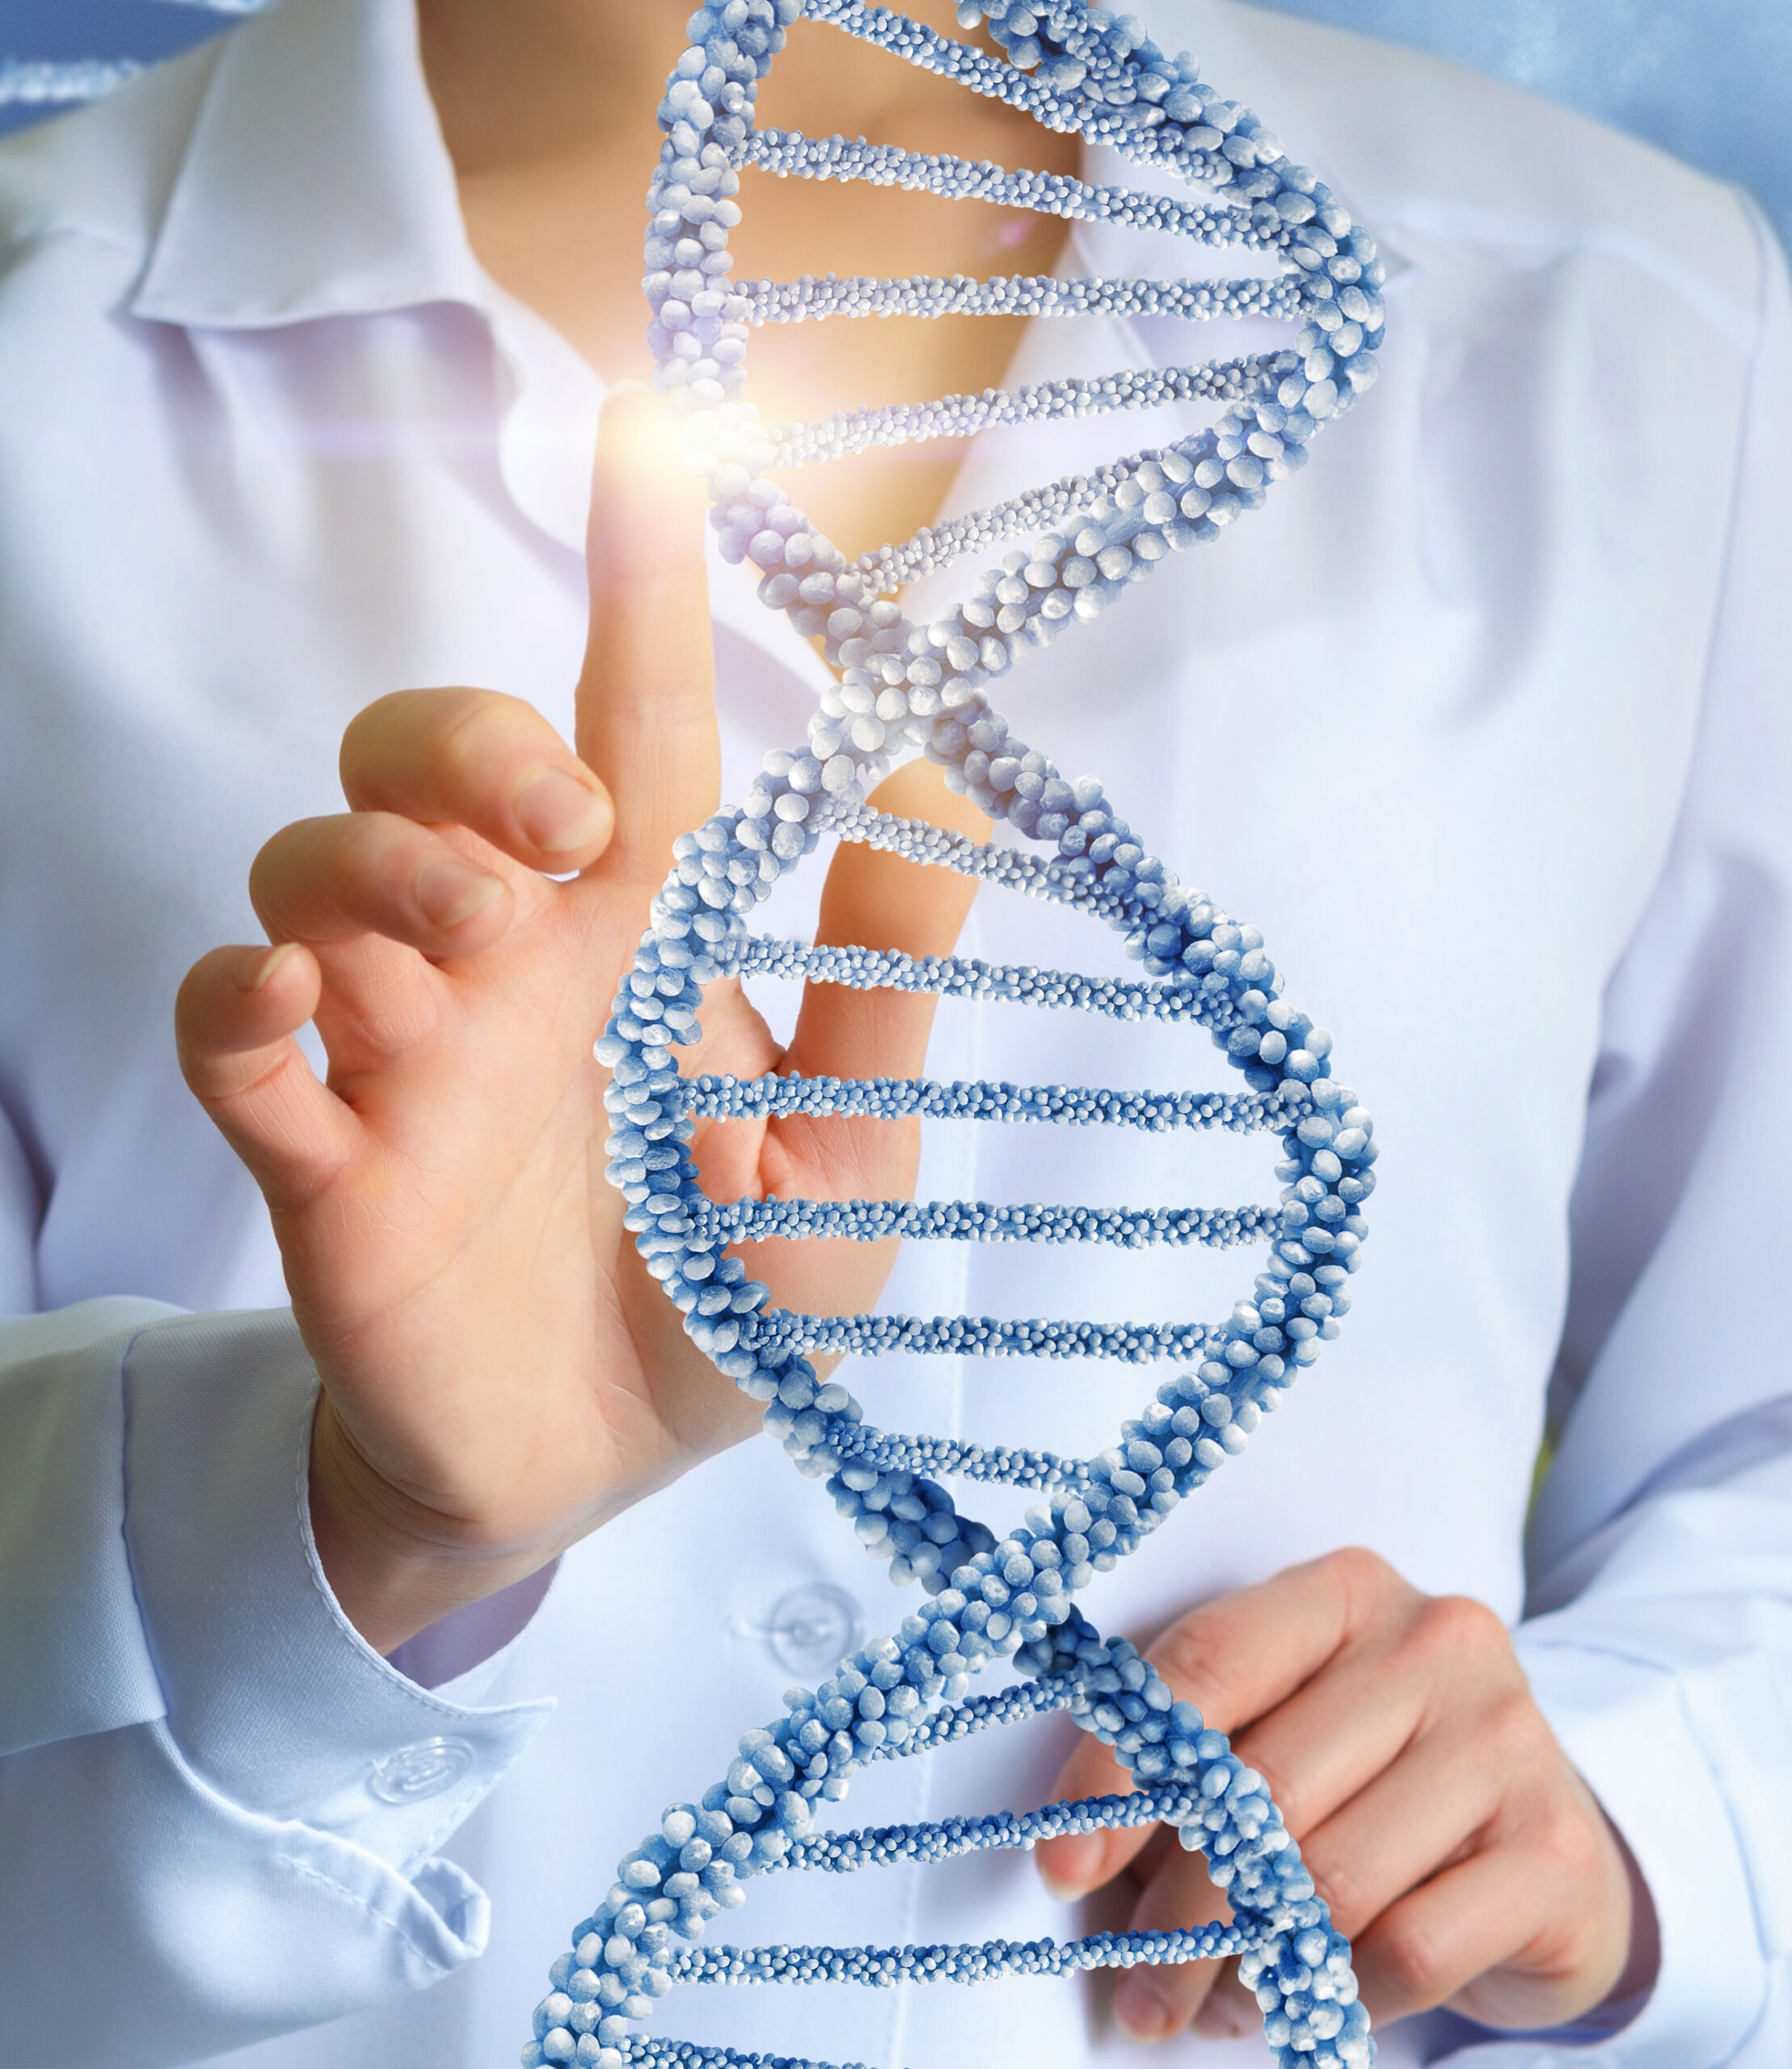 hpc storage for bioinformatics